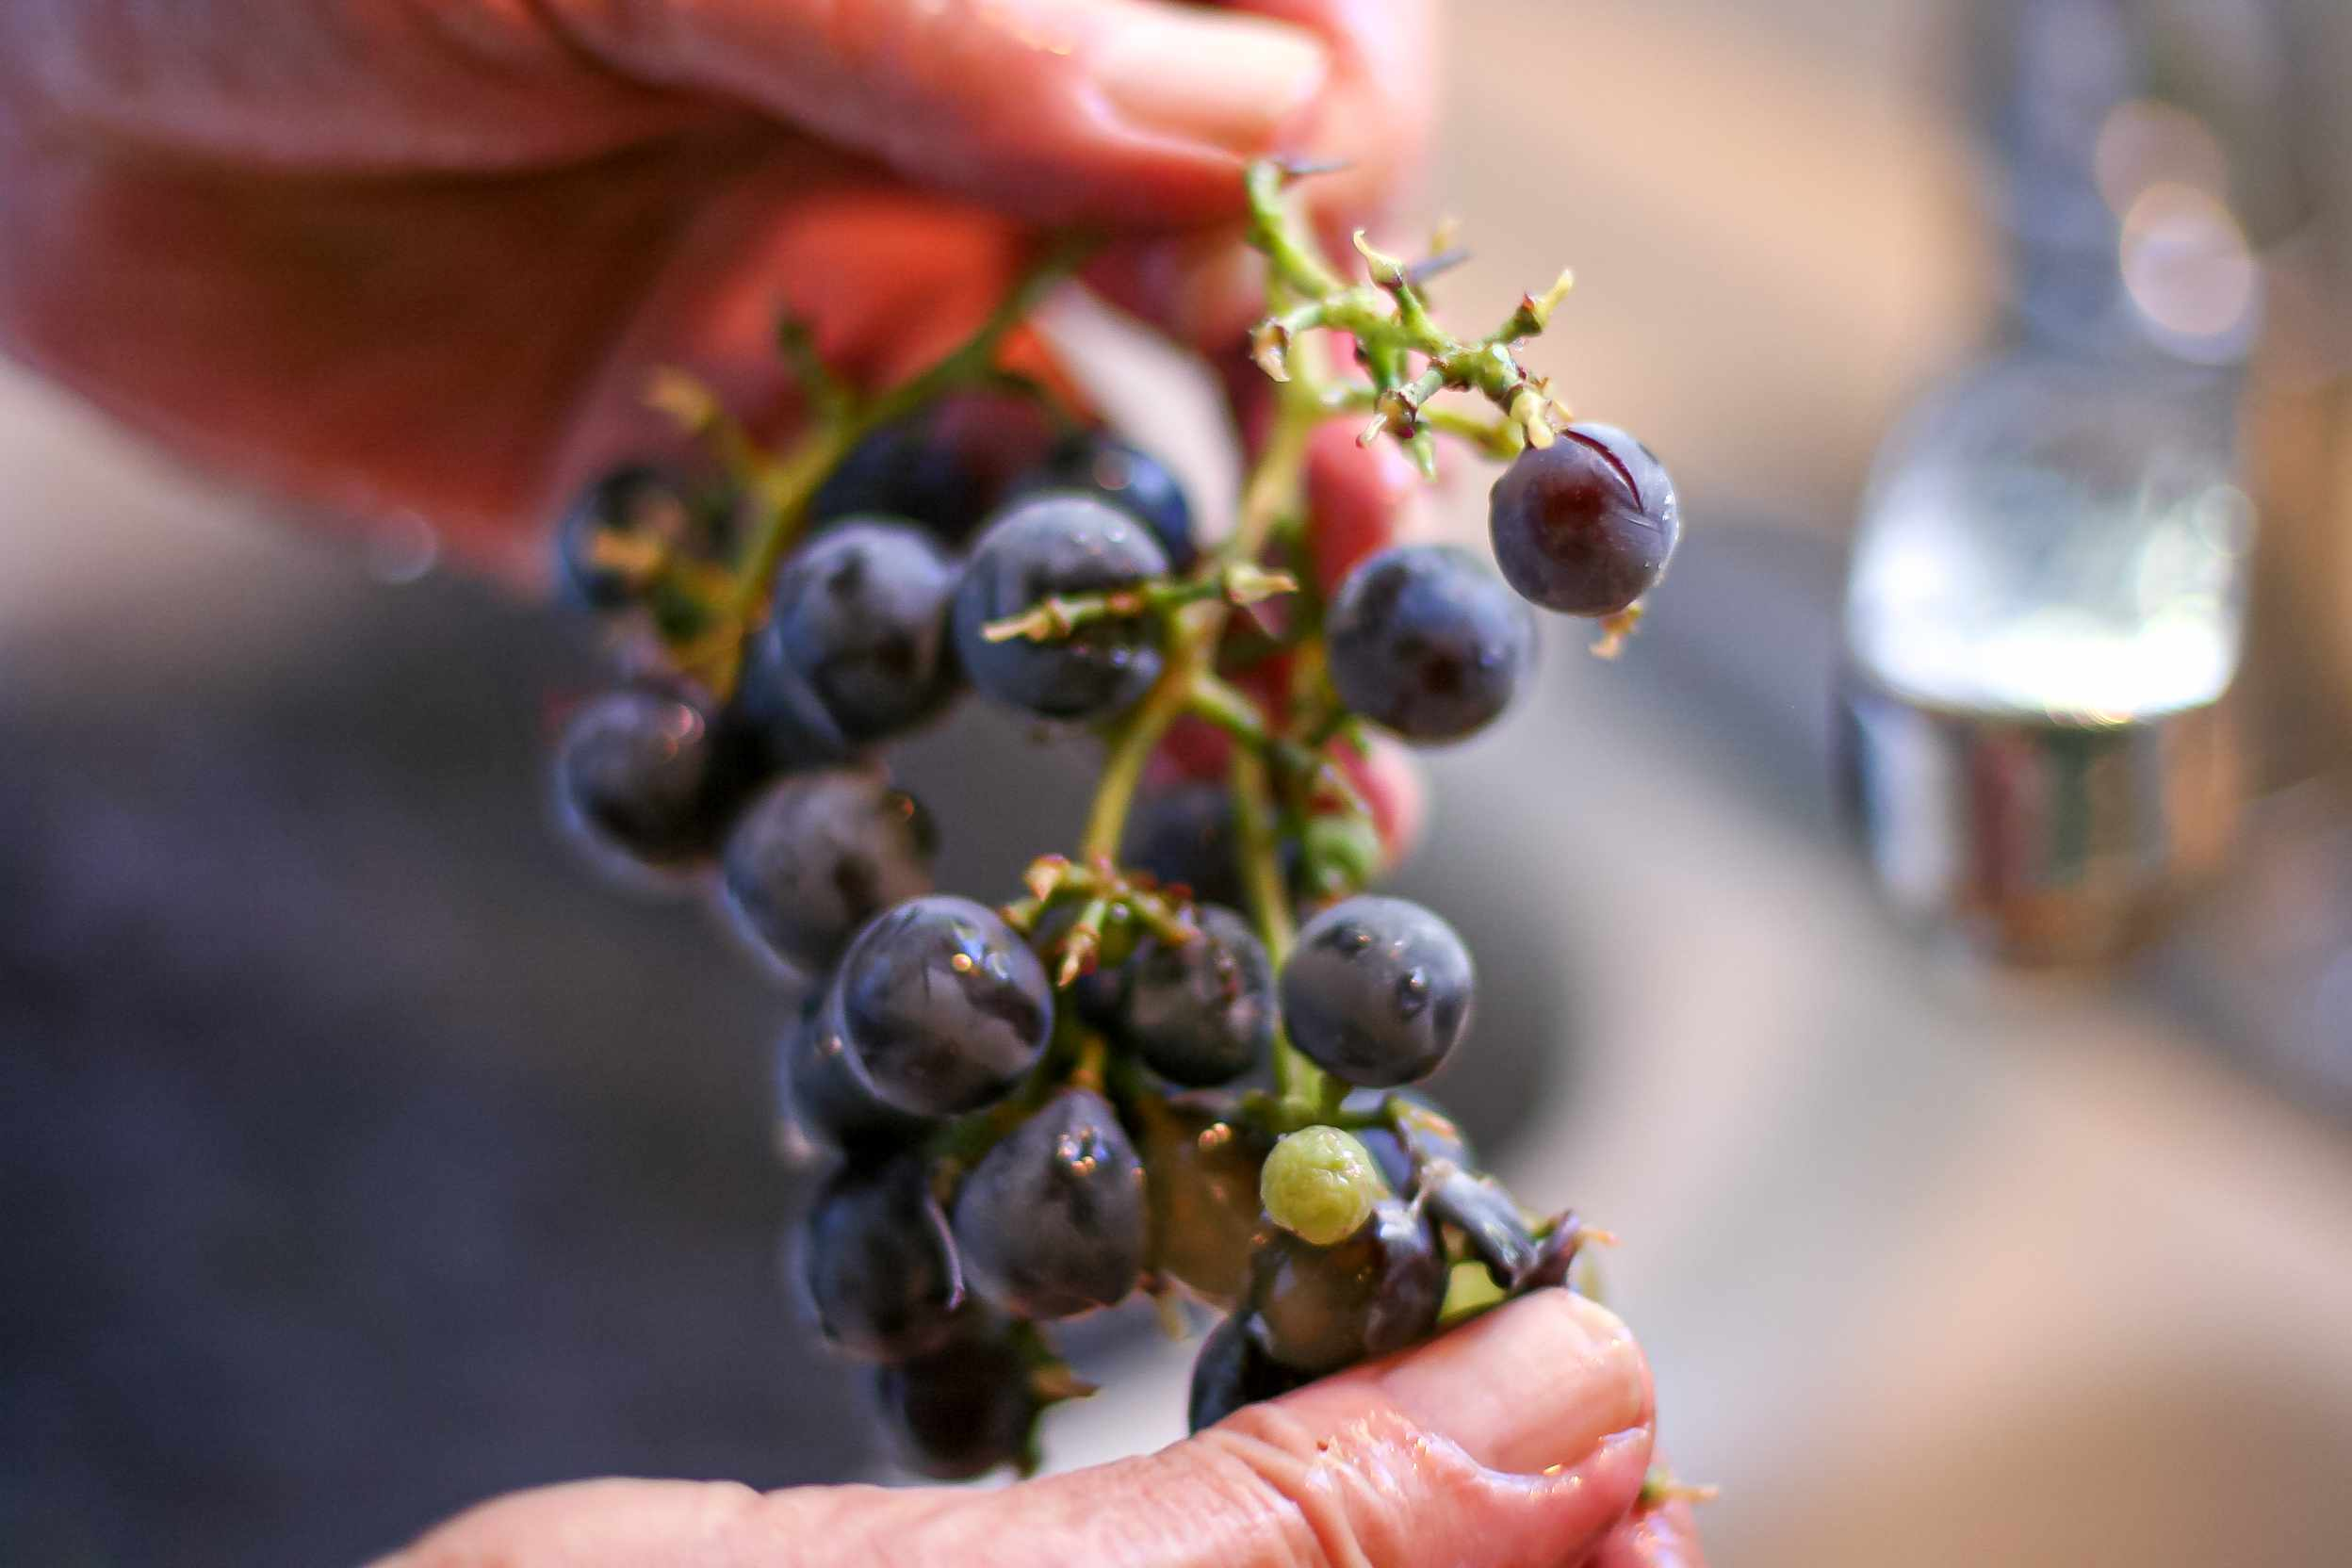 A person holding concord grapes.